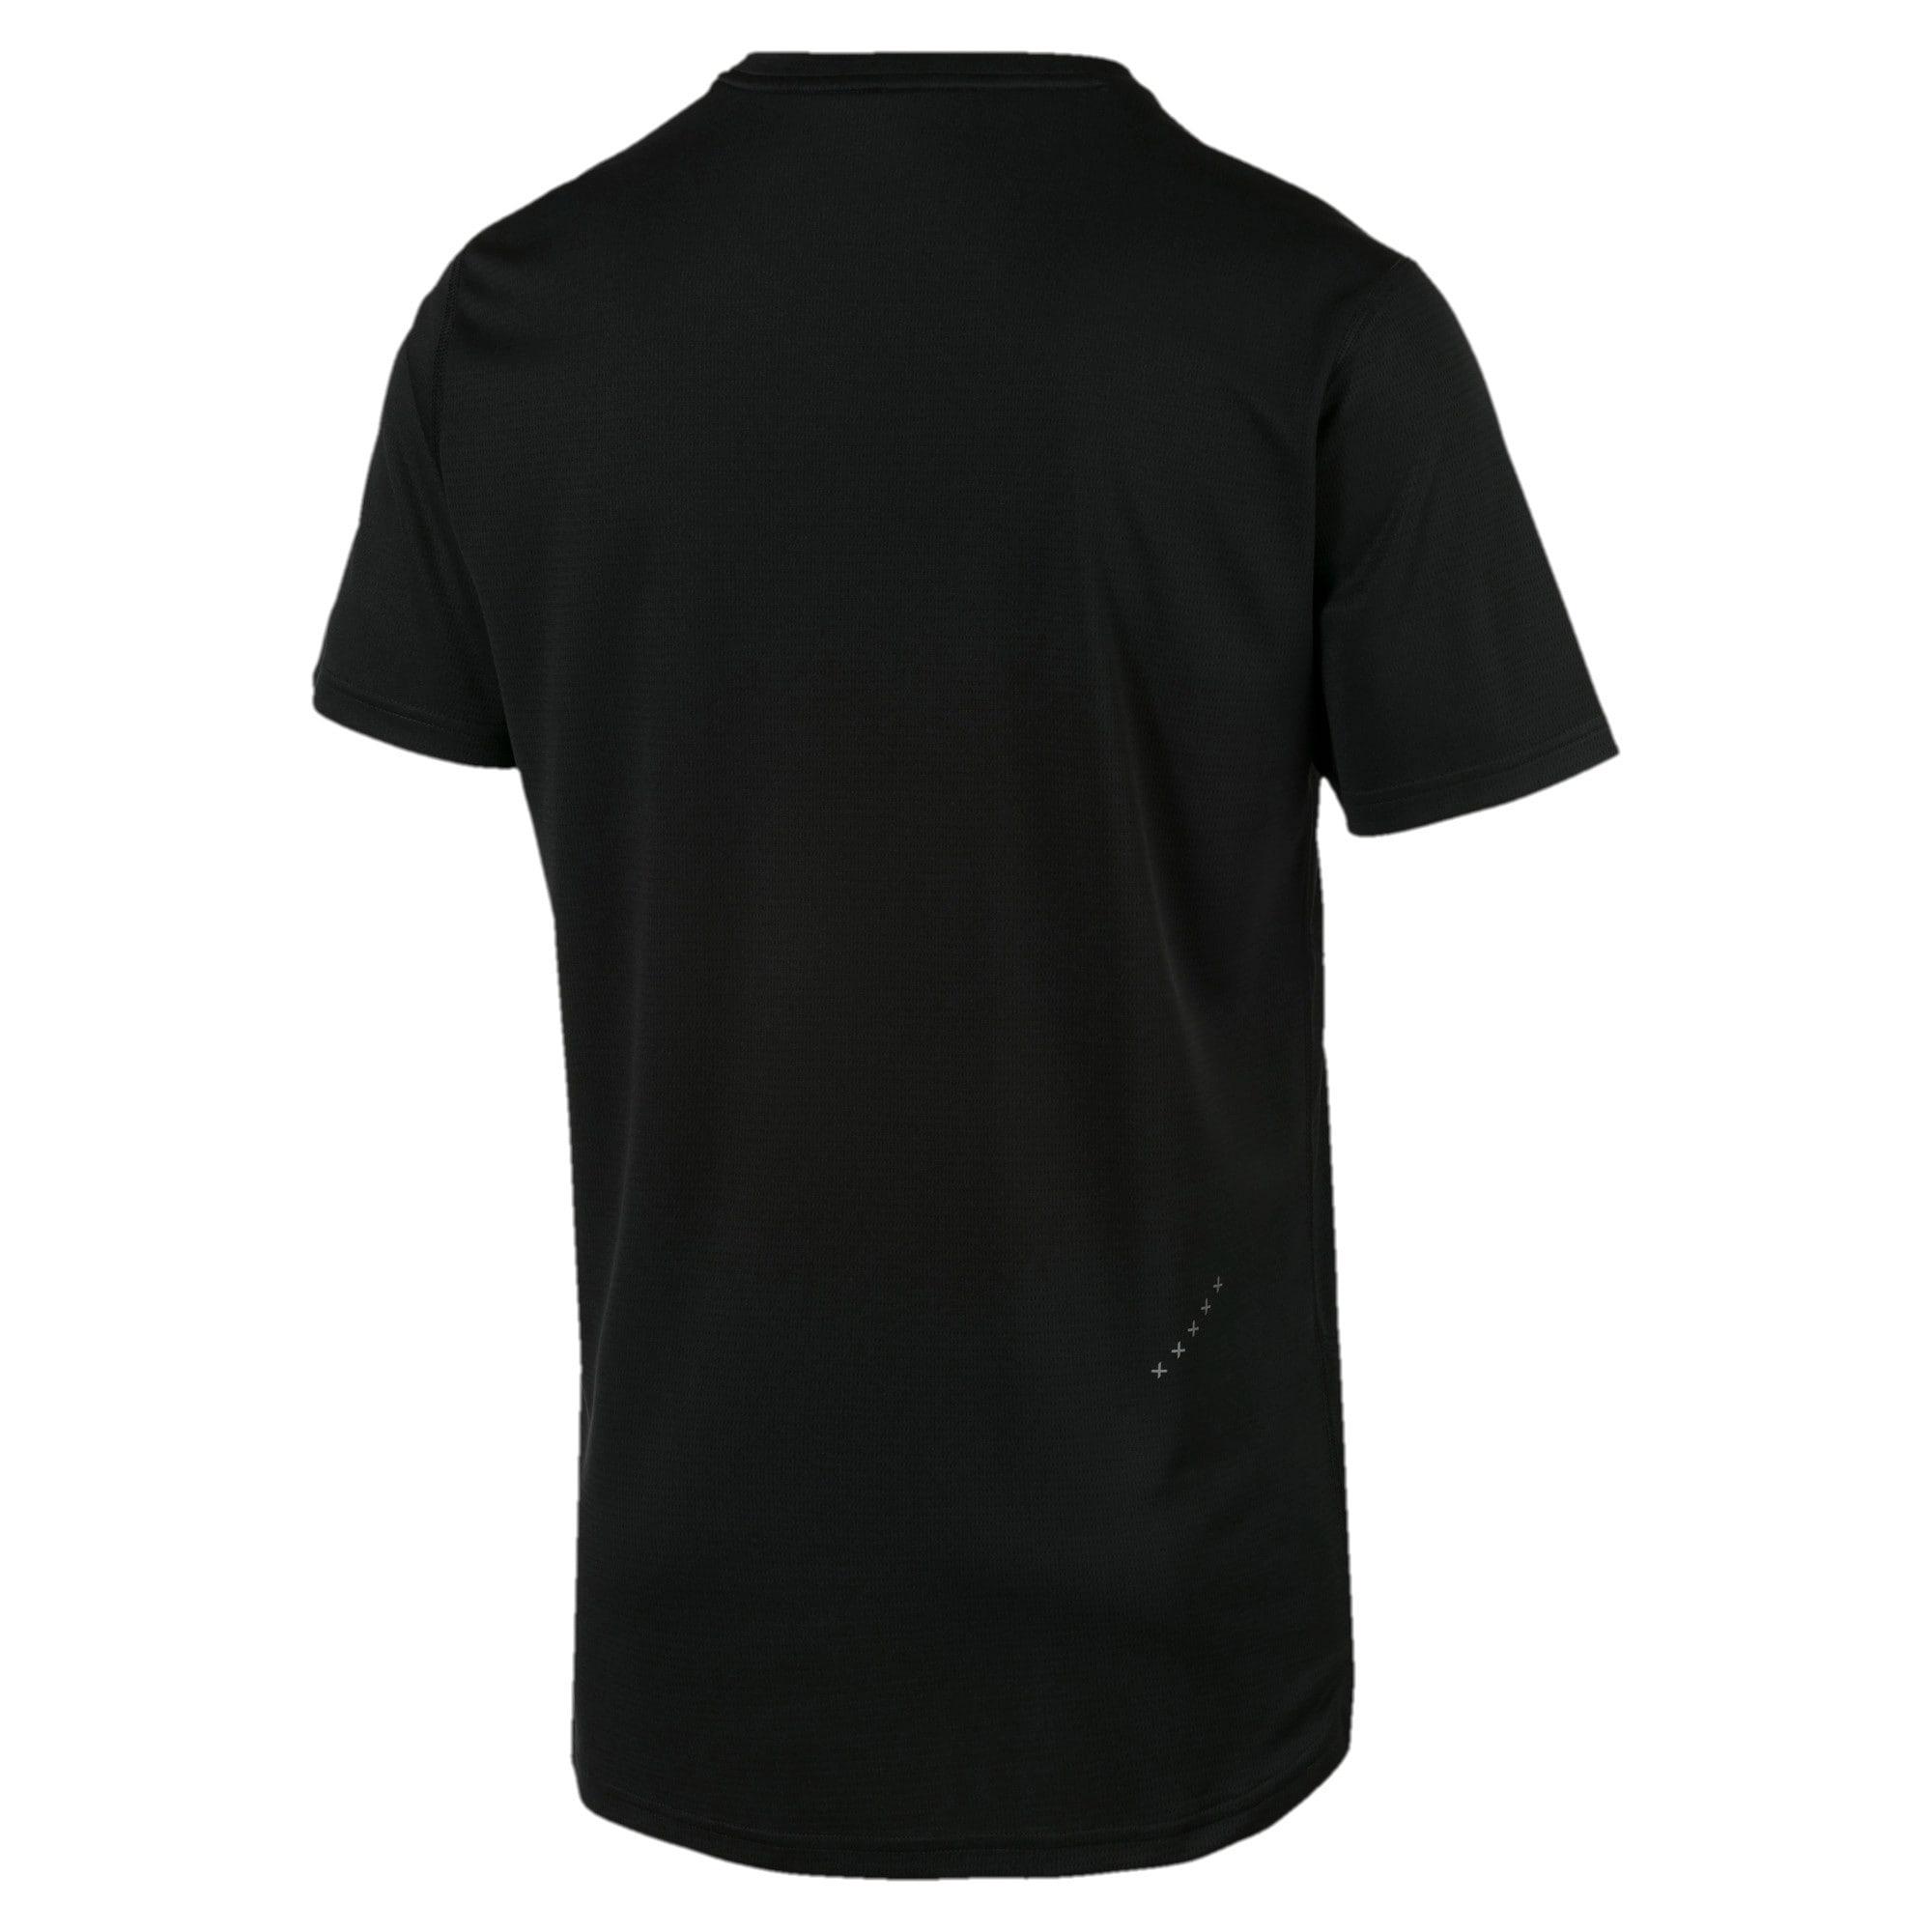 Thumbnail 5 of IGNITE hardloopshirt voor heren, Puma Black, medium